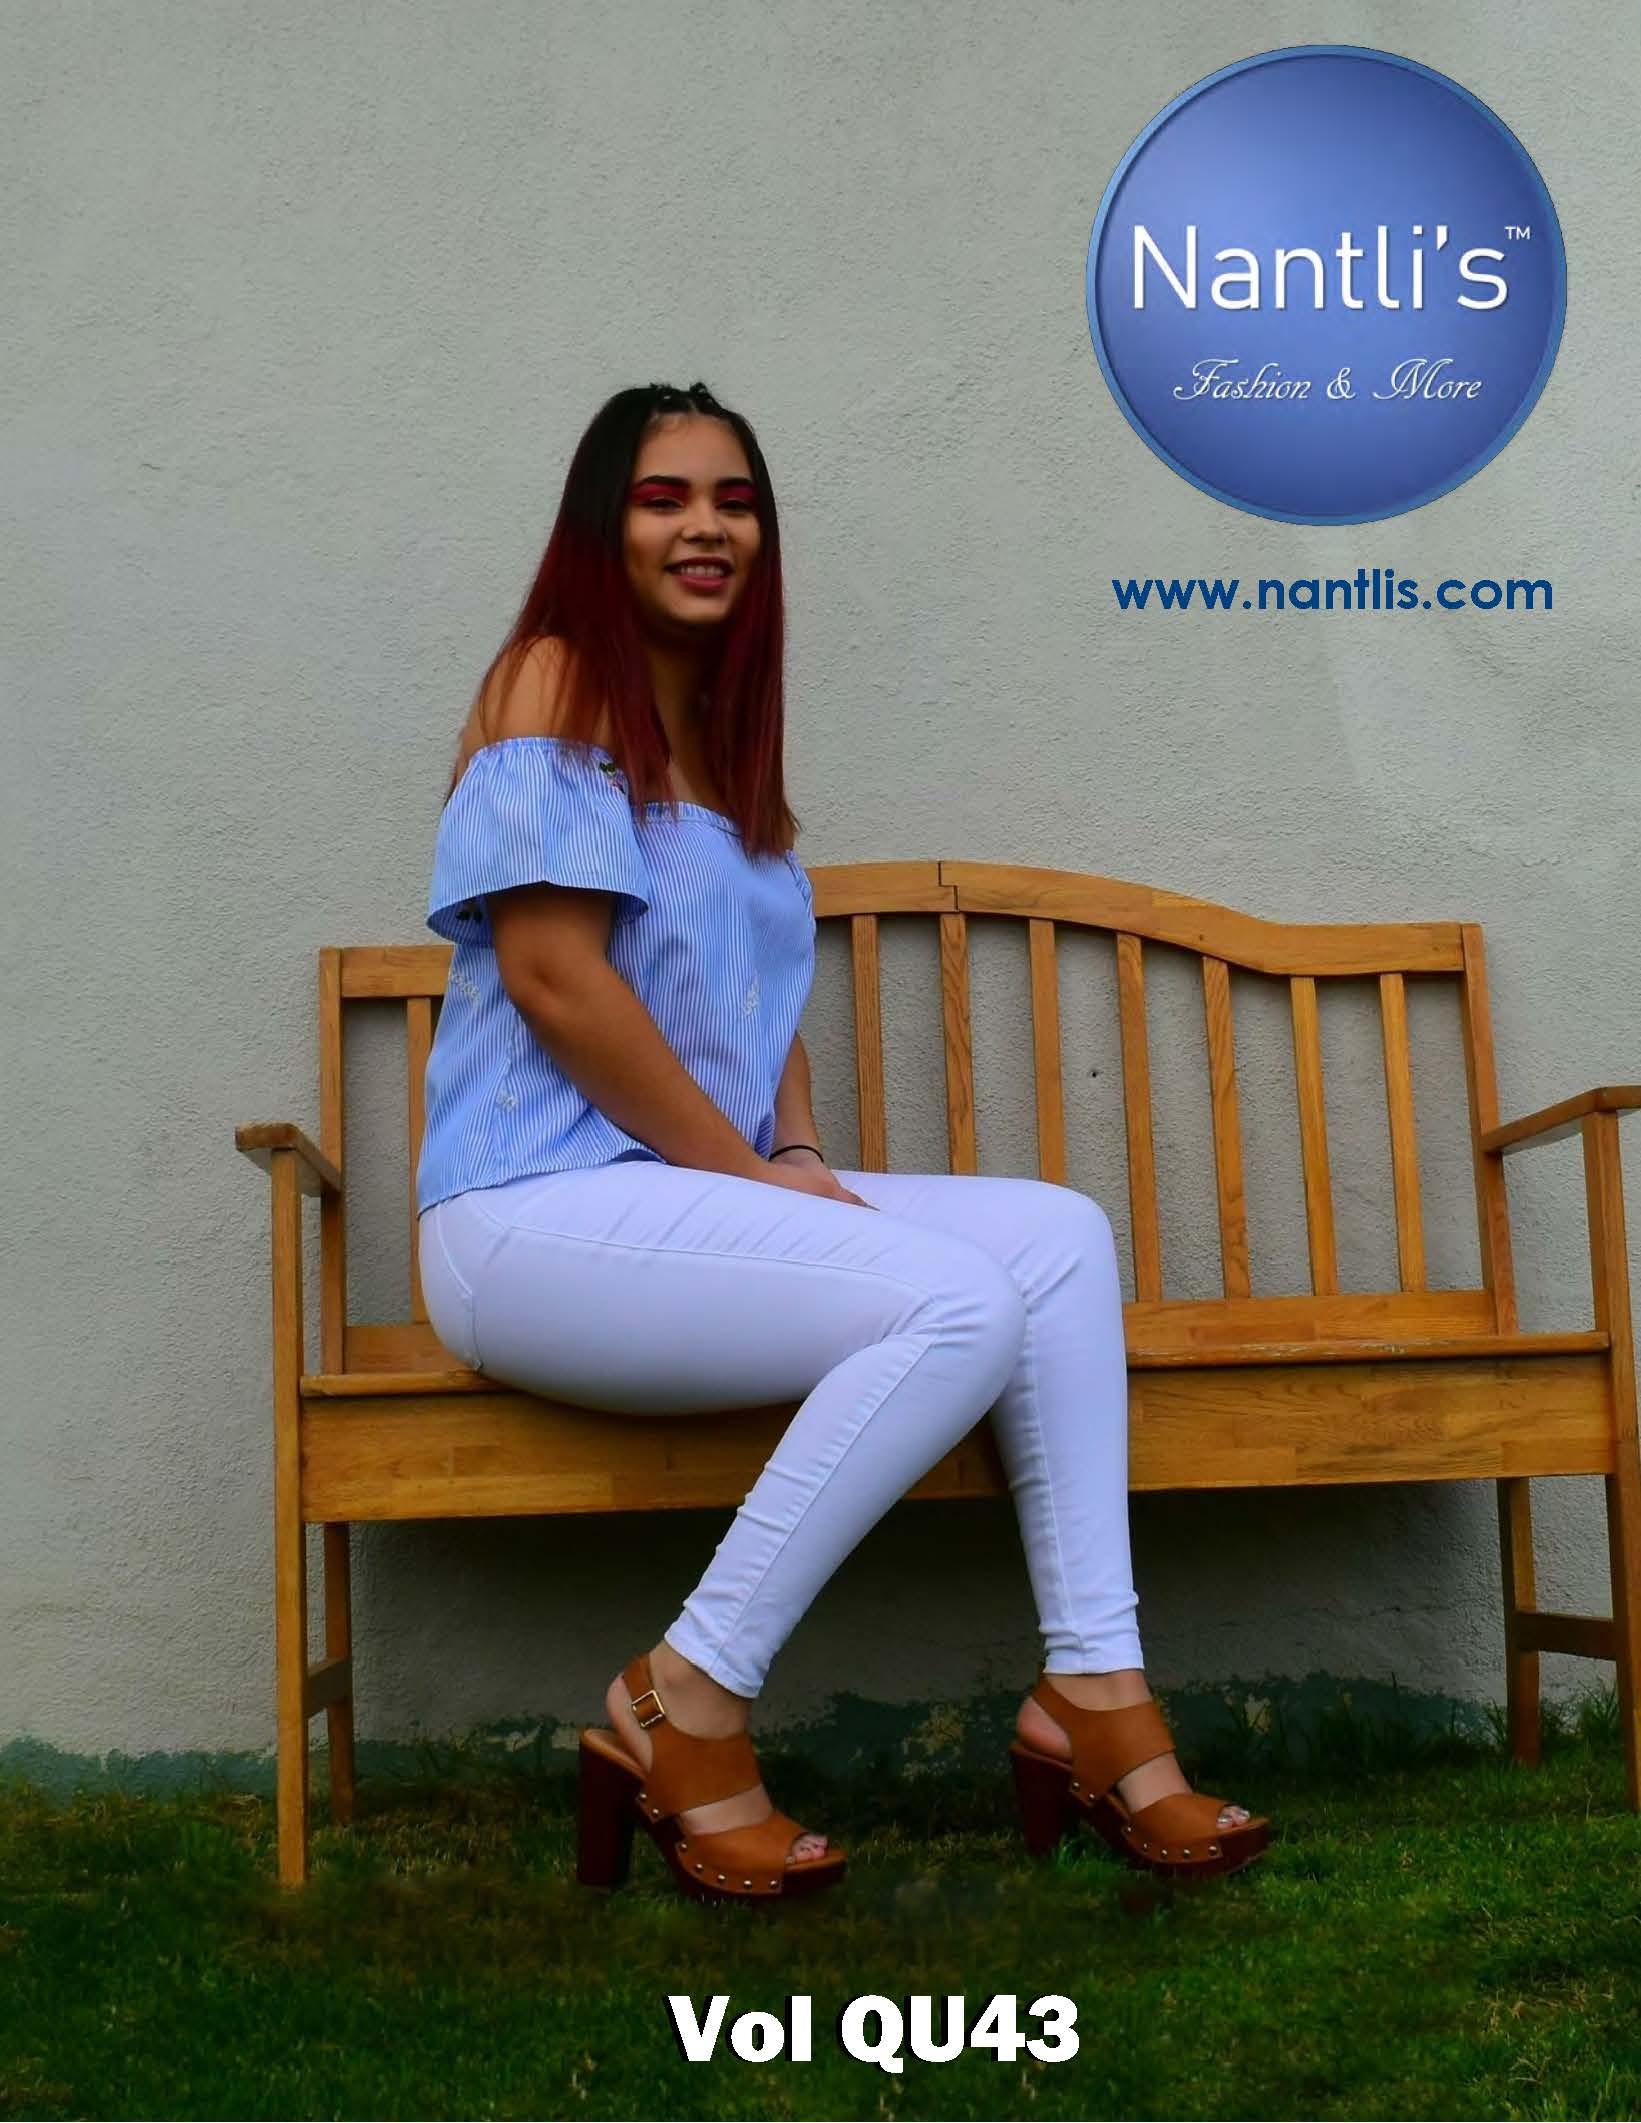 Nantlis Vol QU43 Zapatos para mujer mayoreo Wholesale shoes for women_Page_01